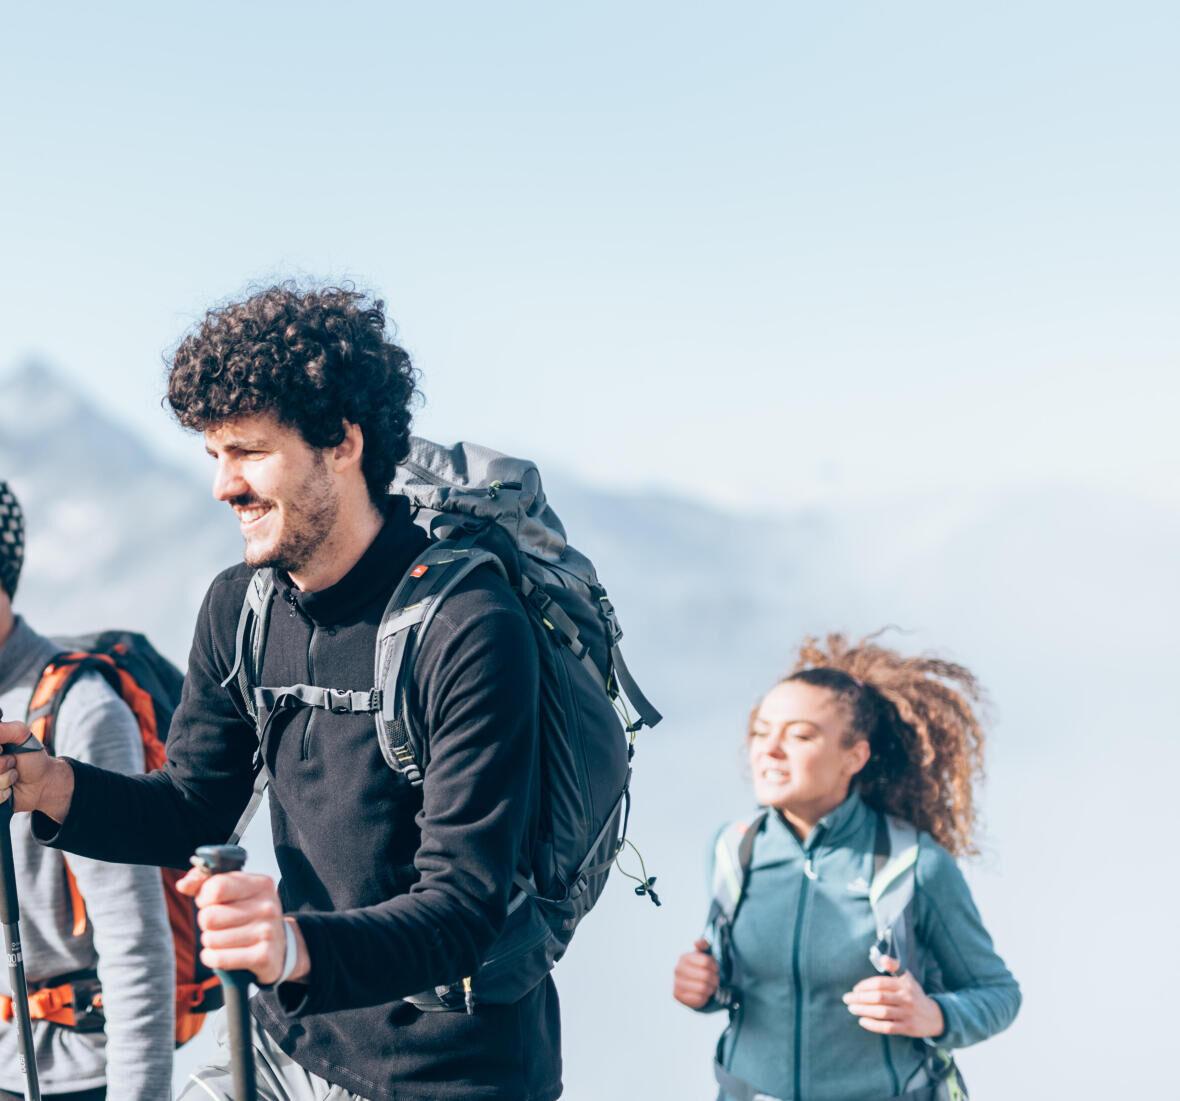 fleece warmth breathability hiking